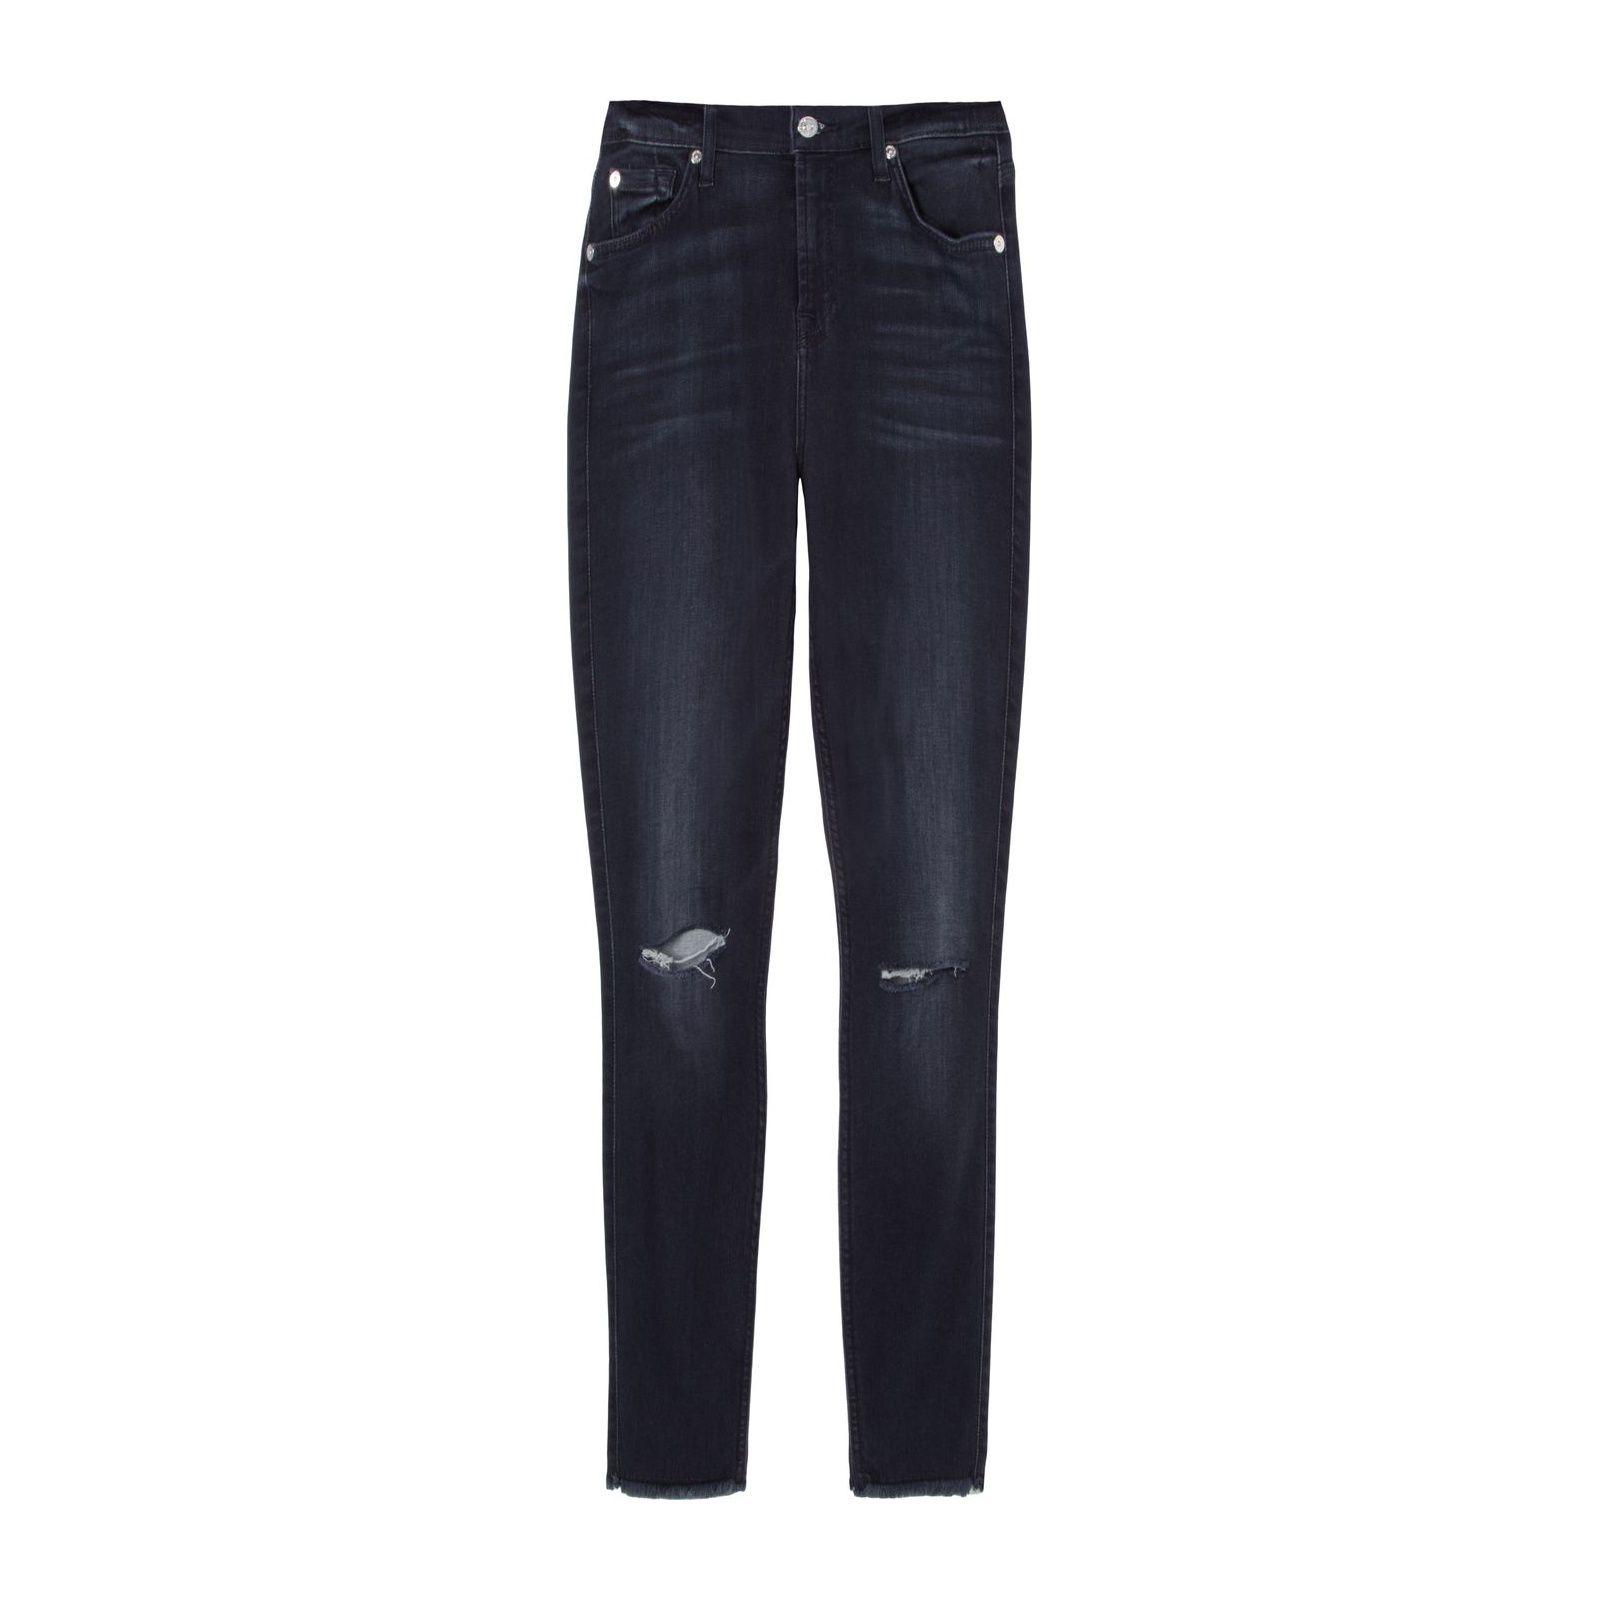 Calça Jeans Ankle Skinny Released - Preta